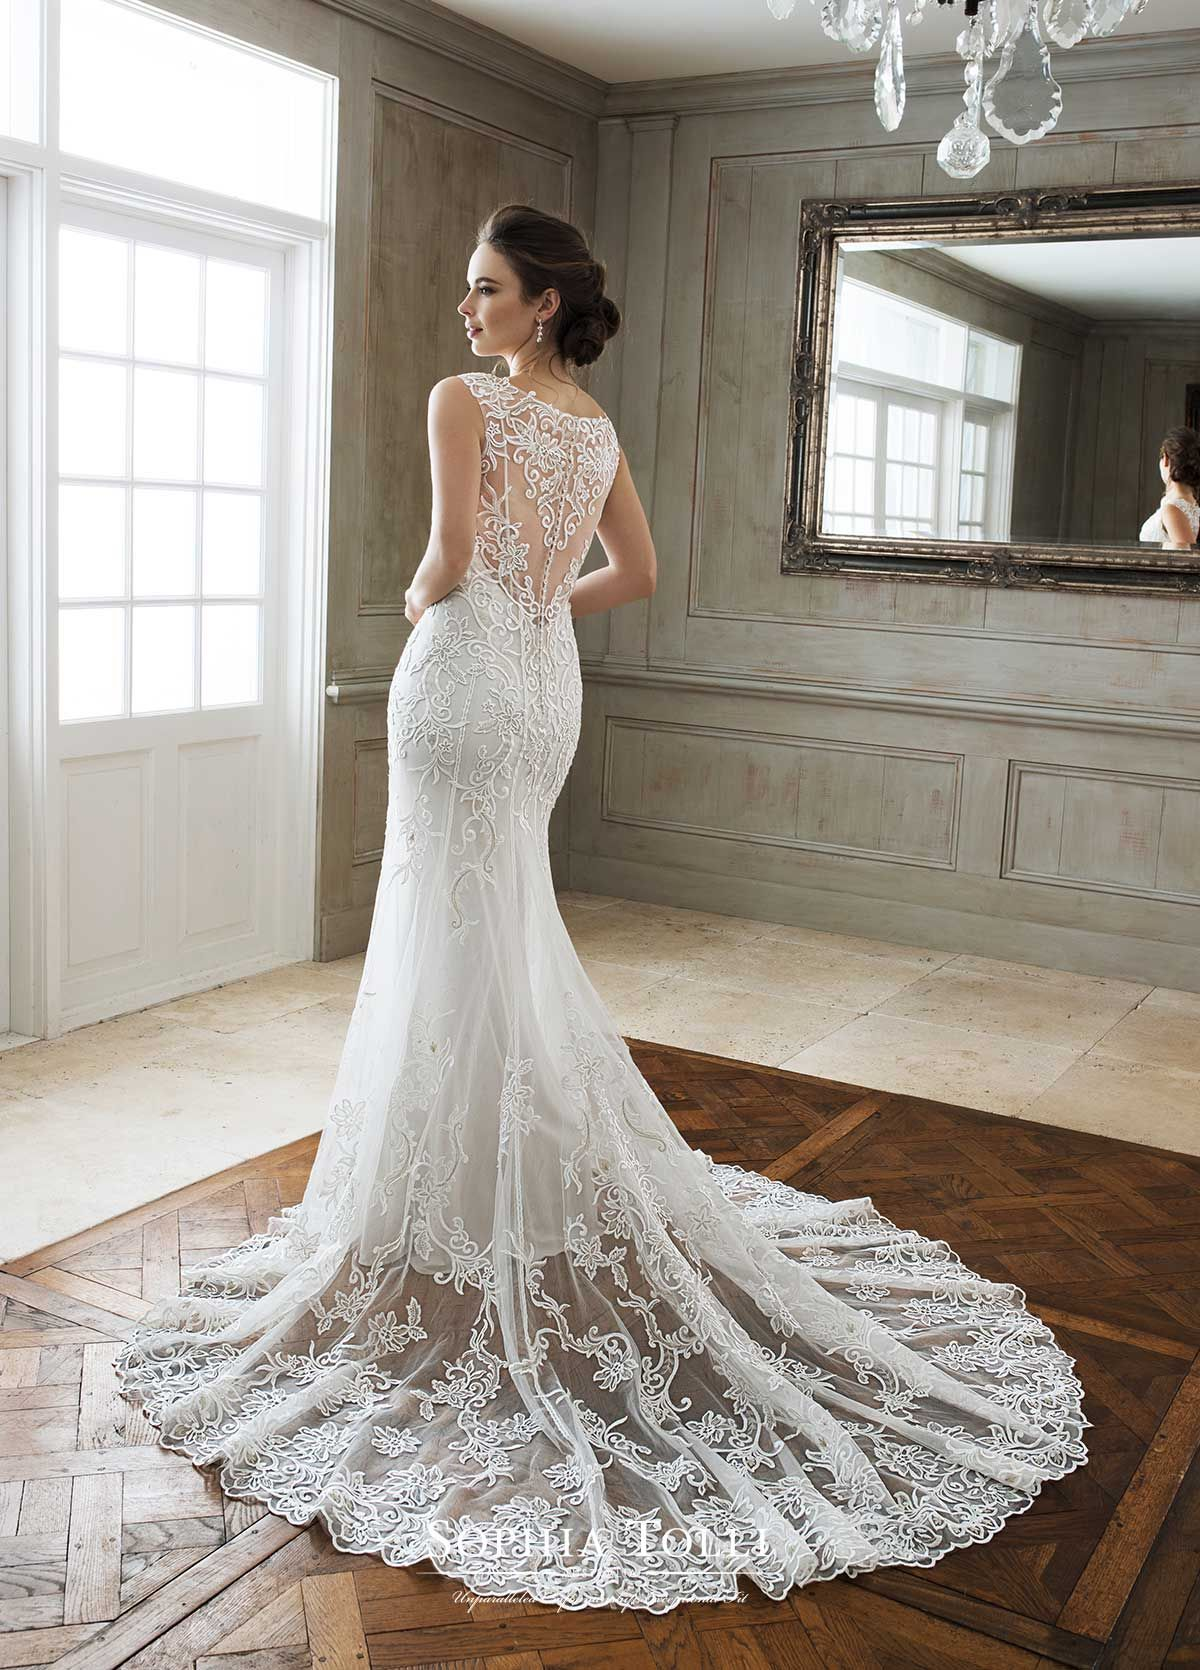 Sophia Tolli Y11896b Sophia Tolli Prices Range From Roughly 800 1500 Wedding Dresses Bridal Wedding Dresses Wedding Dresses Photos